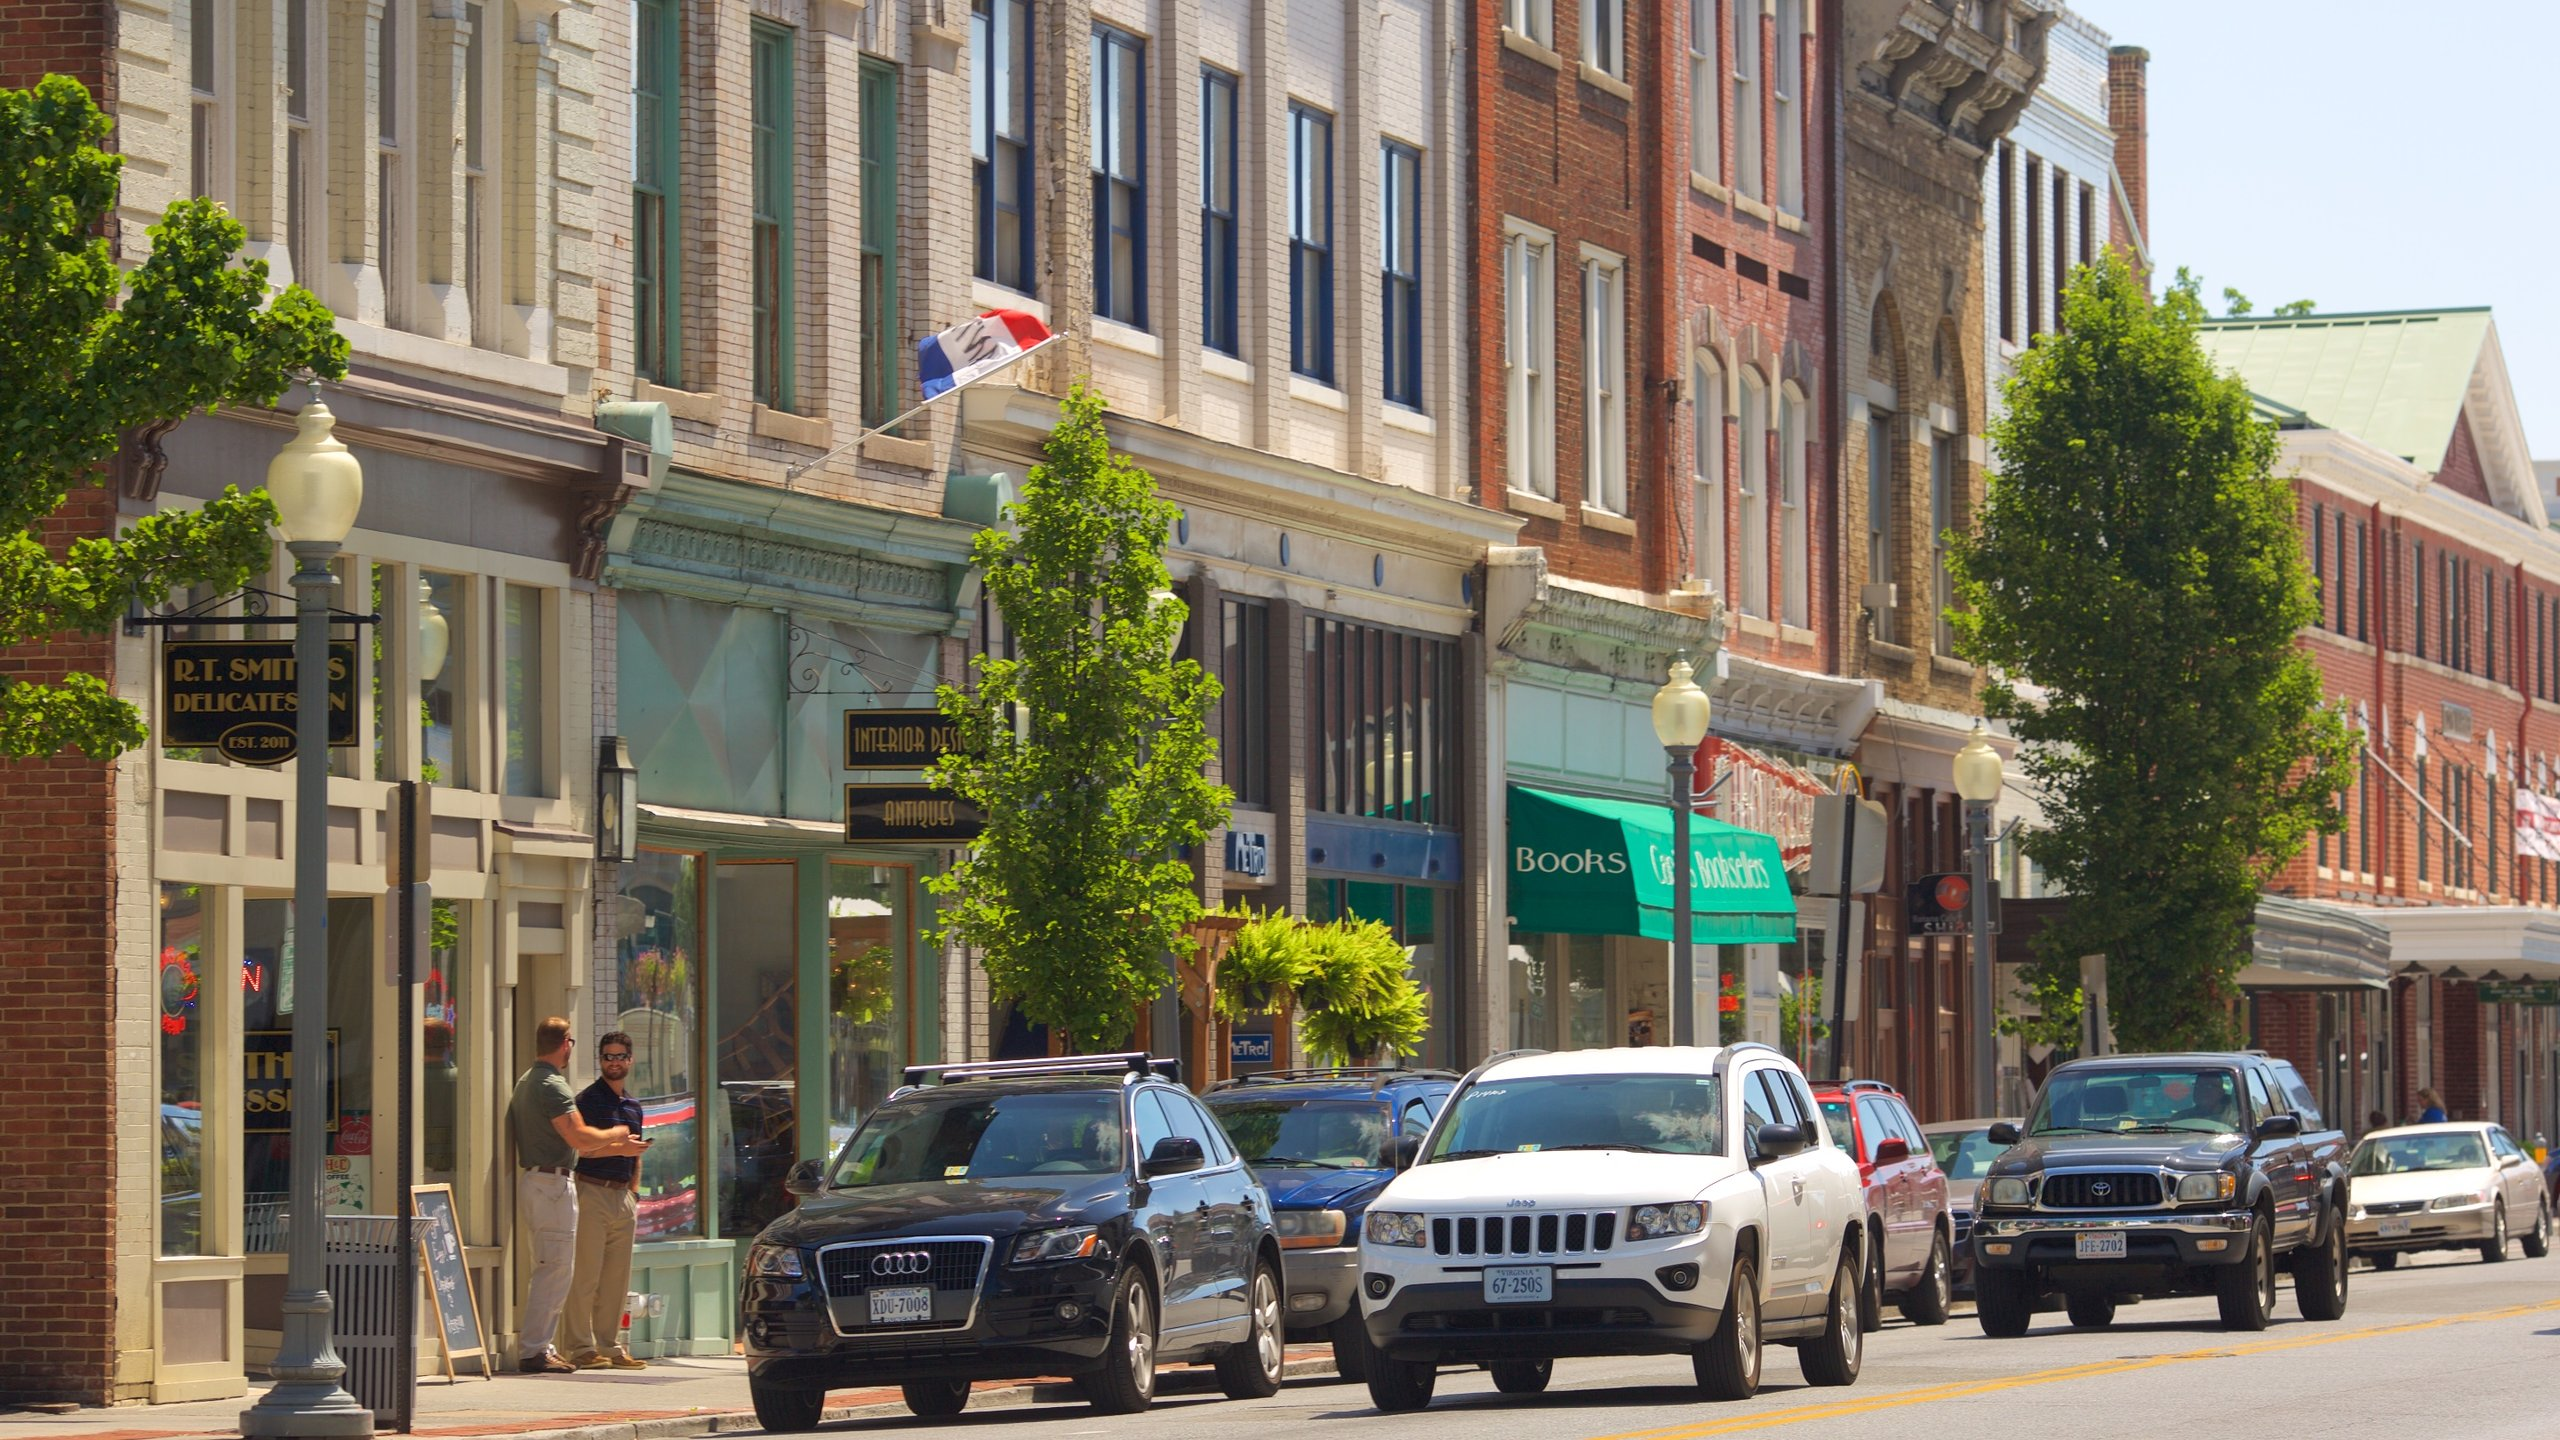 Top 10 Historic Hotels In Roanoke Va Full Of Heritage 46